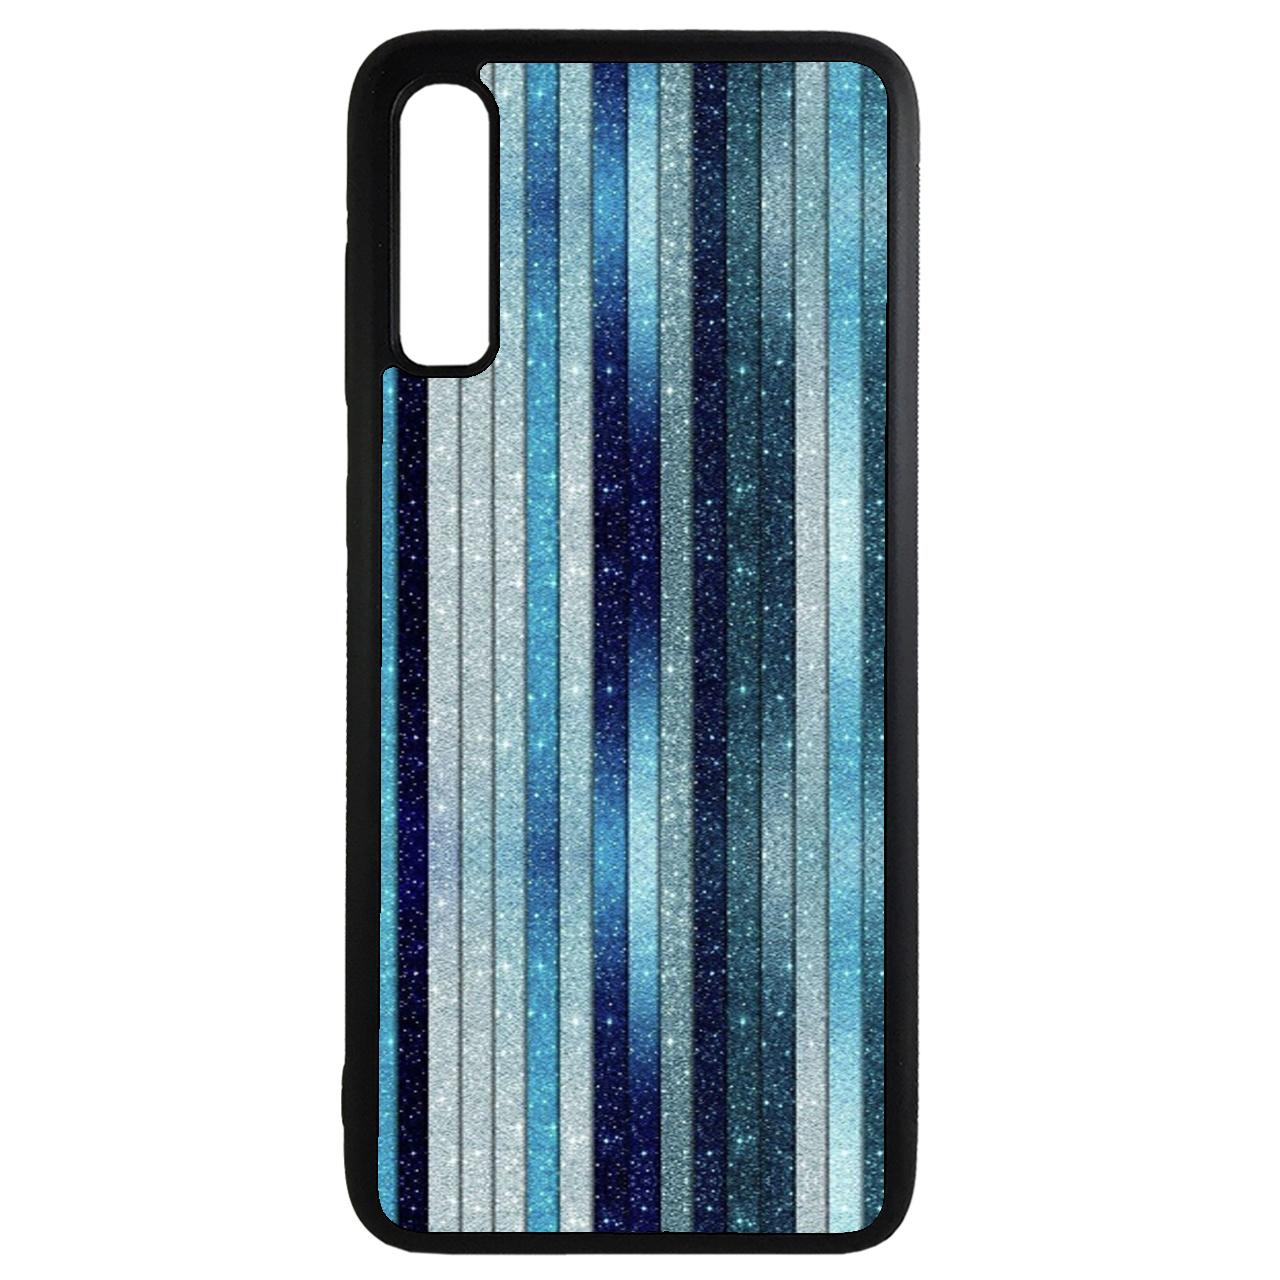 کاور طرح رنگارنگ کد 11050646 مناسب برای گوشی موبایل سامسونگ galaxy a70